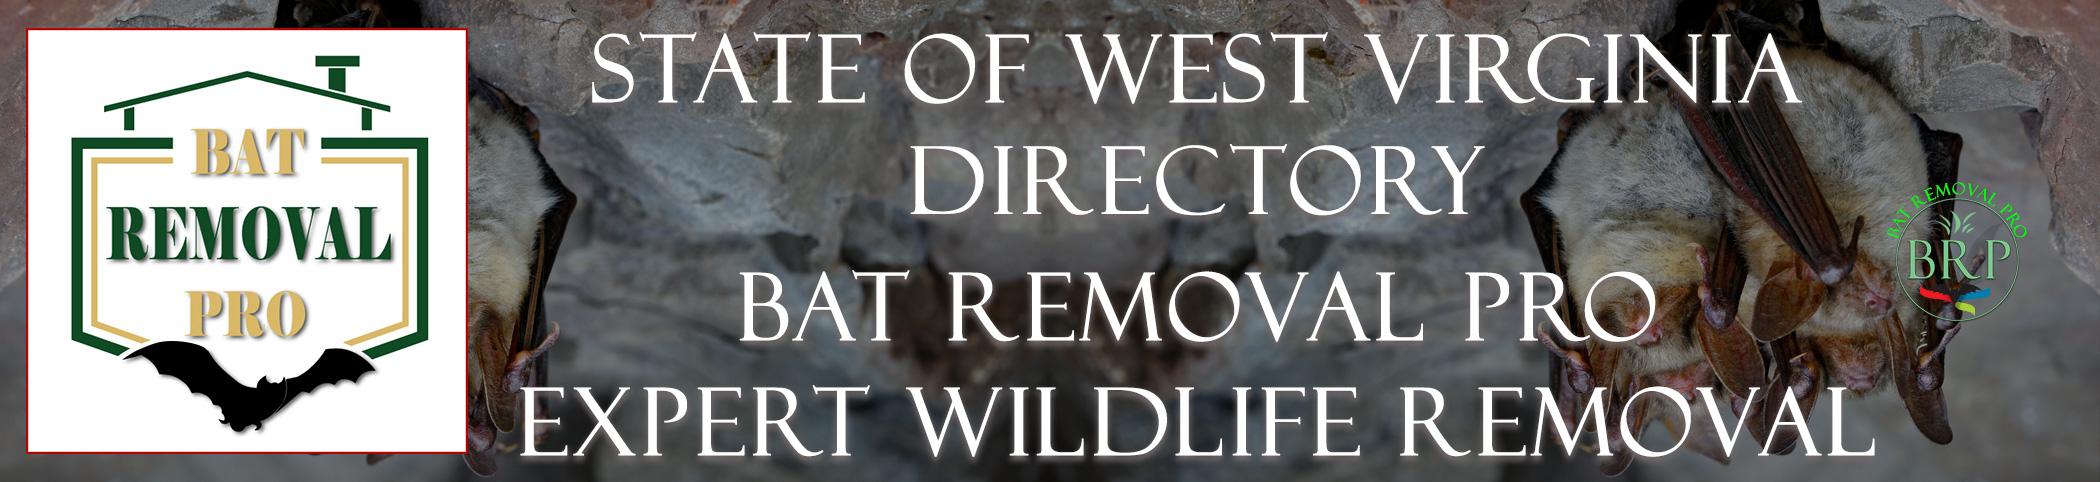 WEST-VIRGINIA-bat-removal-at-bat-removal-pro-header-image